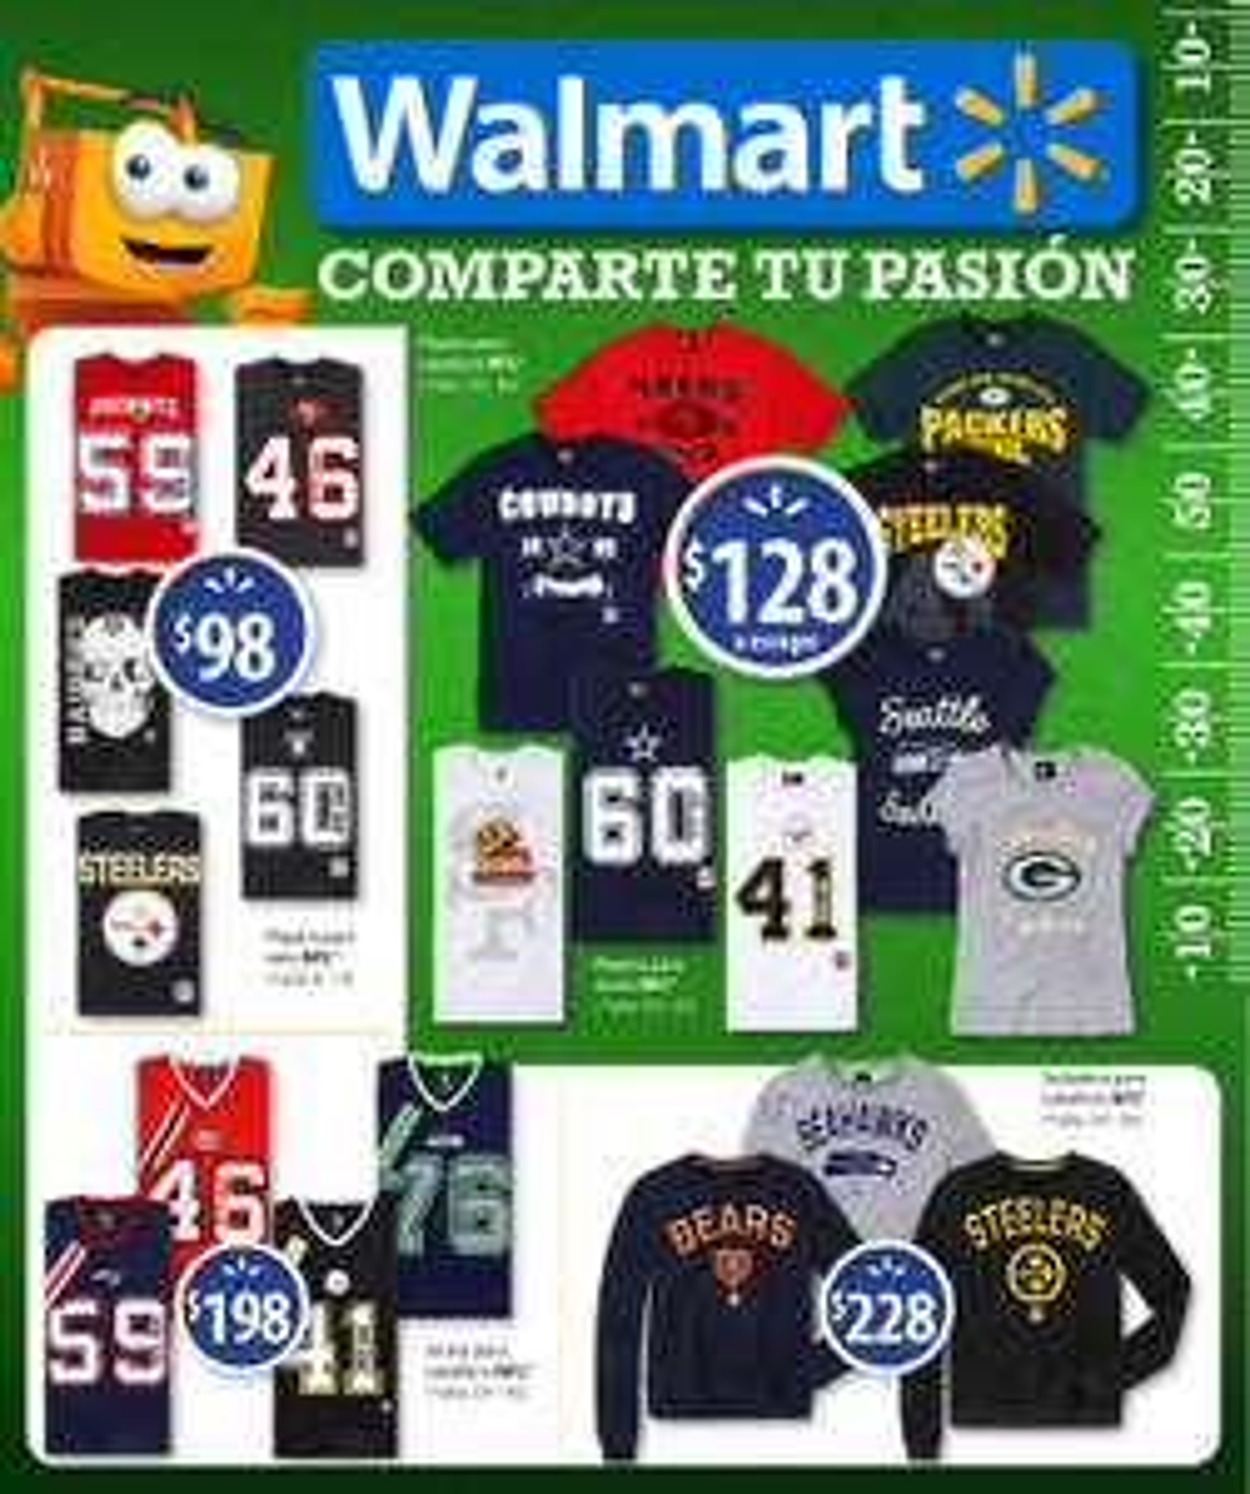 Walmart: Folleto Especial Superbowl 14 de Febrero